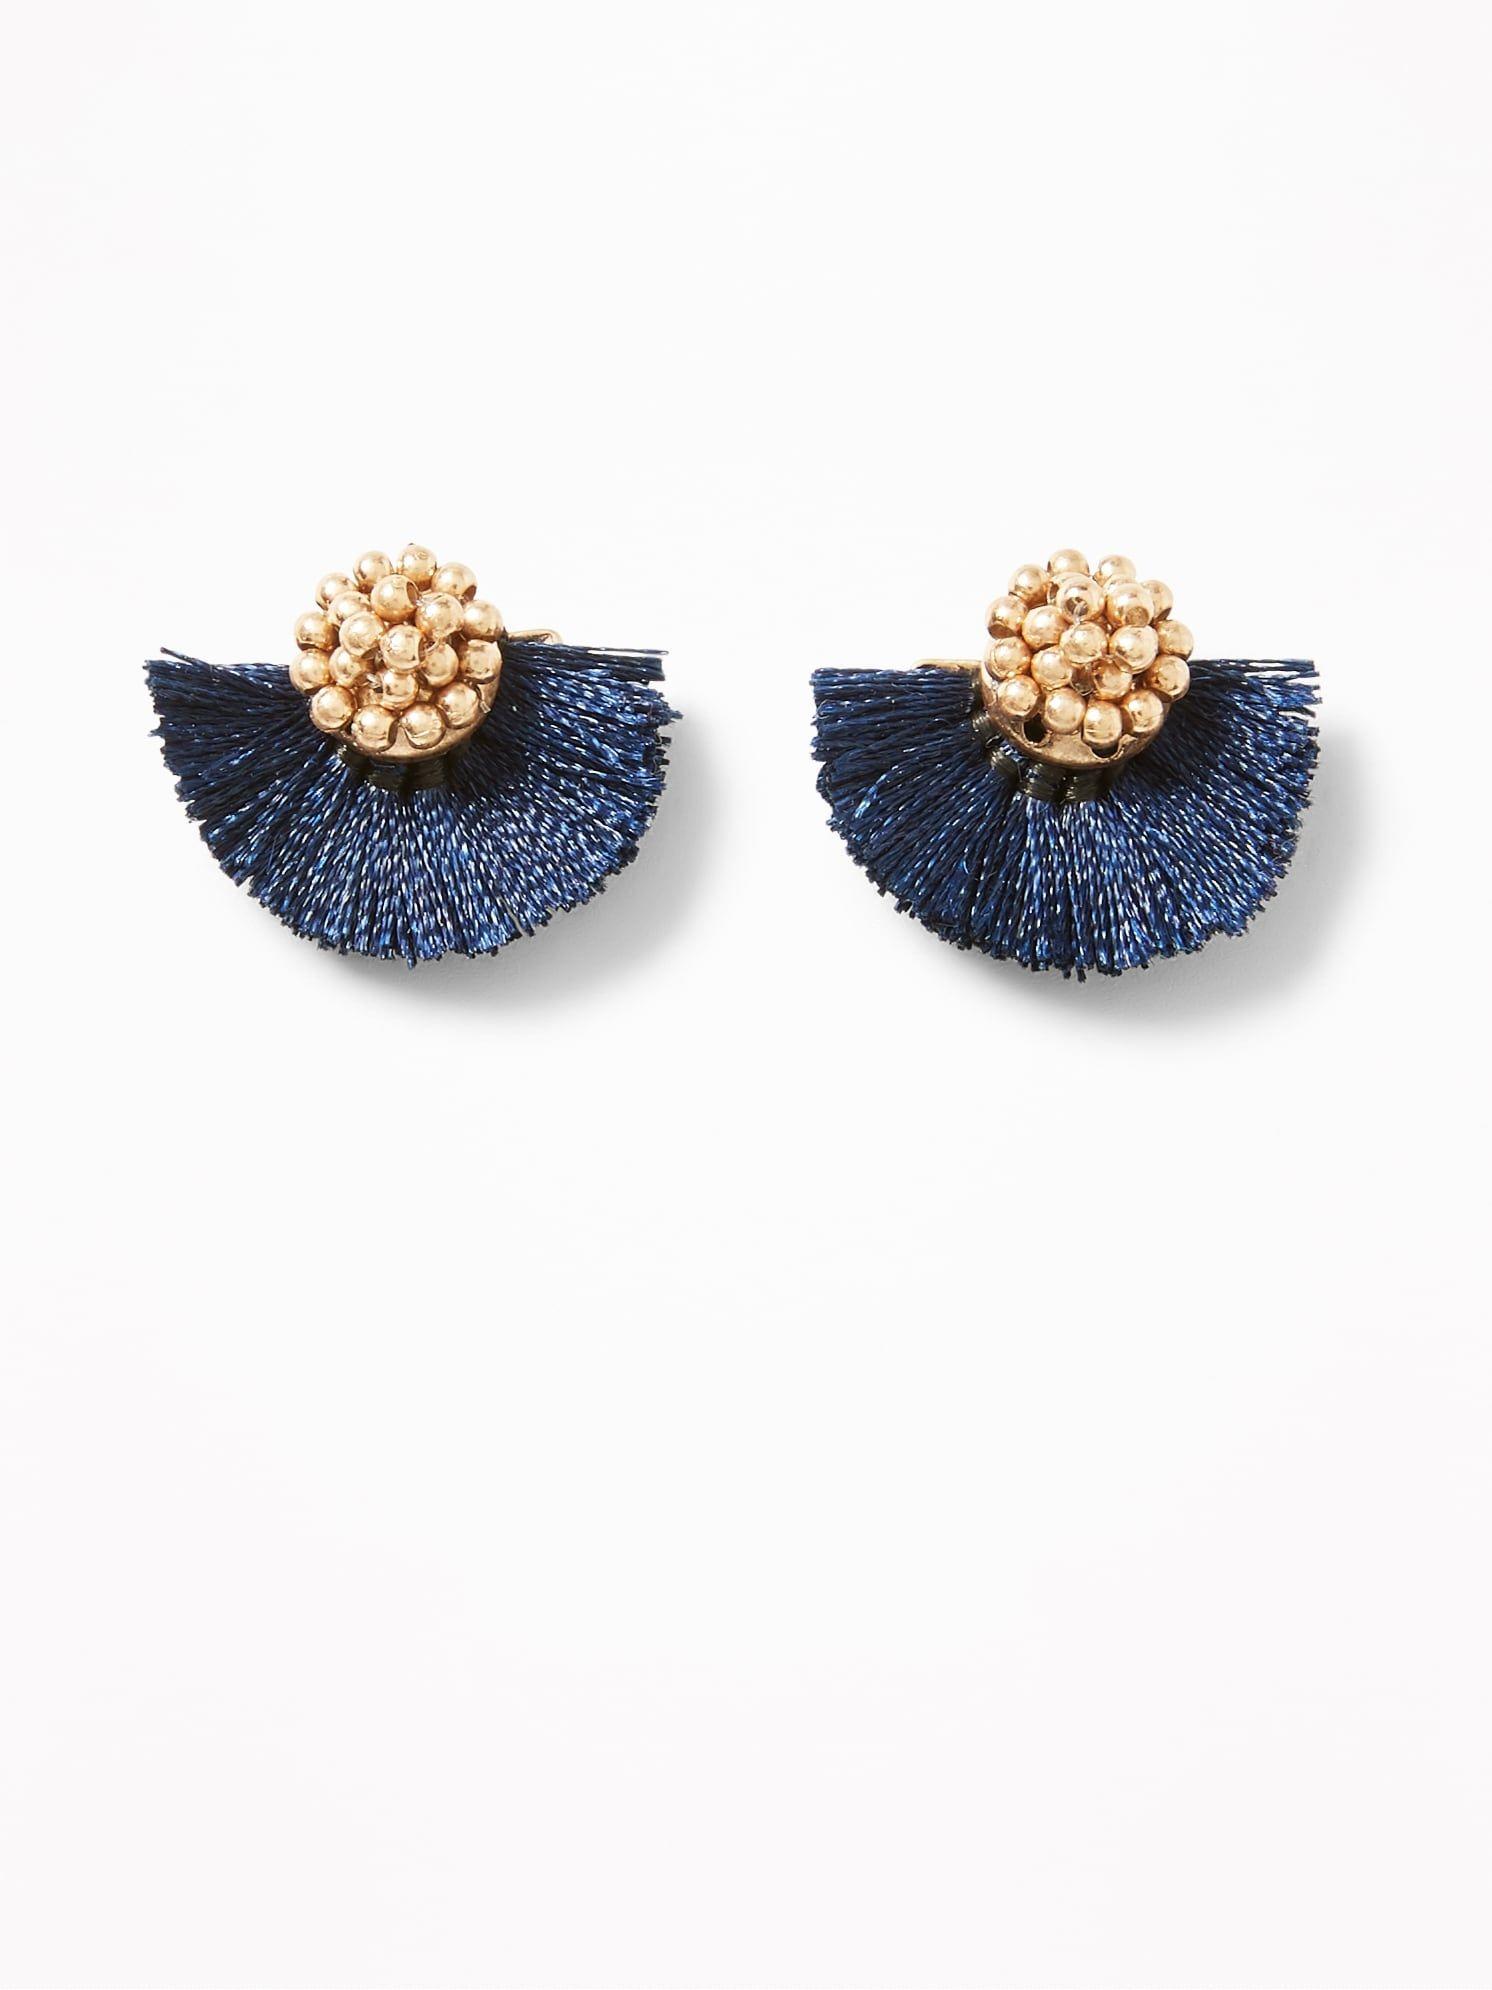 Christmas Gifts Girls Red Christmas Socks Earring Womens 18K Gold Plated Cute Shinning Stud Pierced Earrings